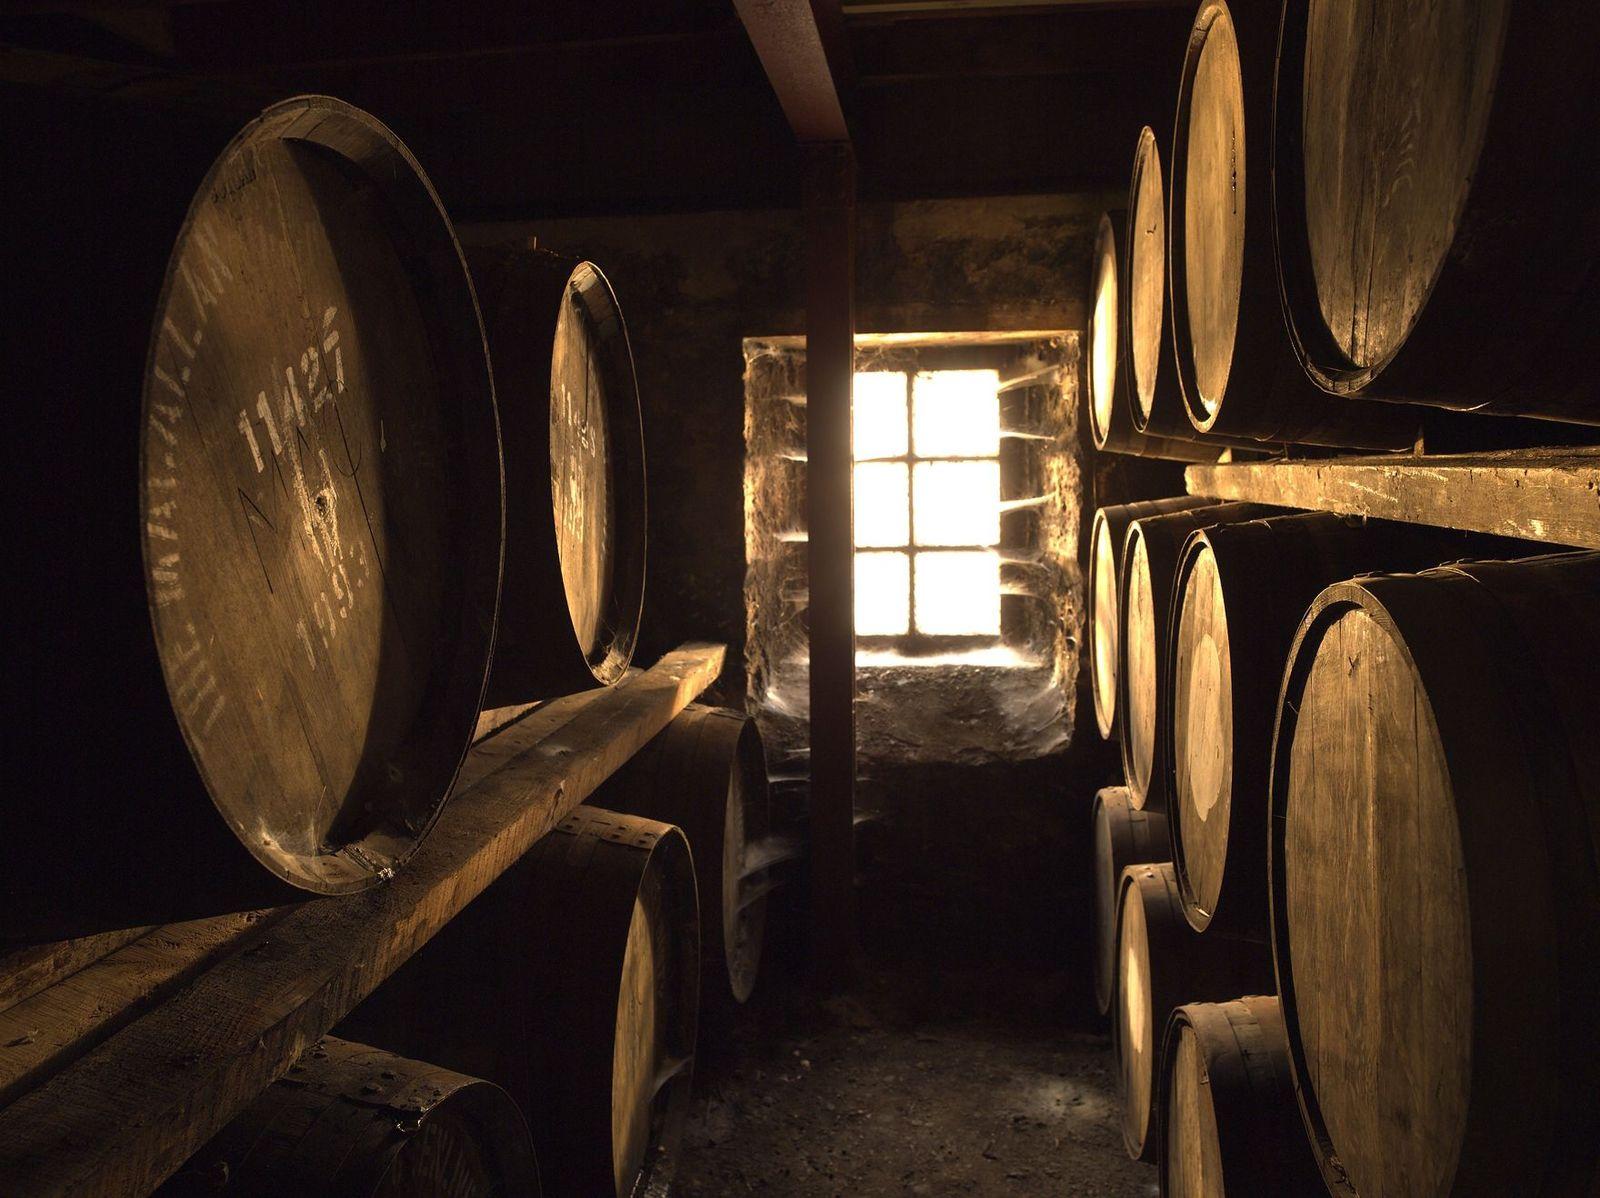 The Macallan Distillery / Whiskey